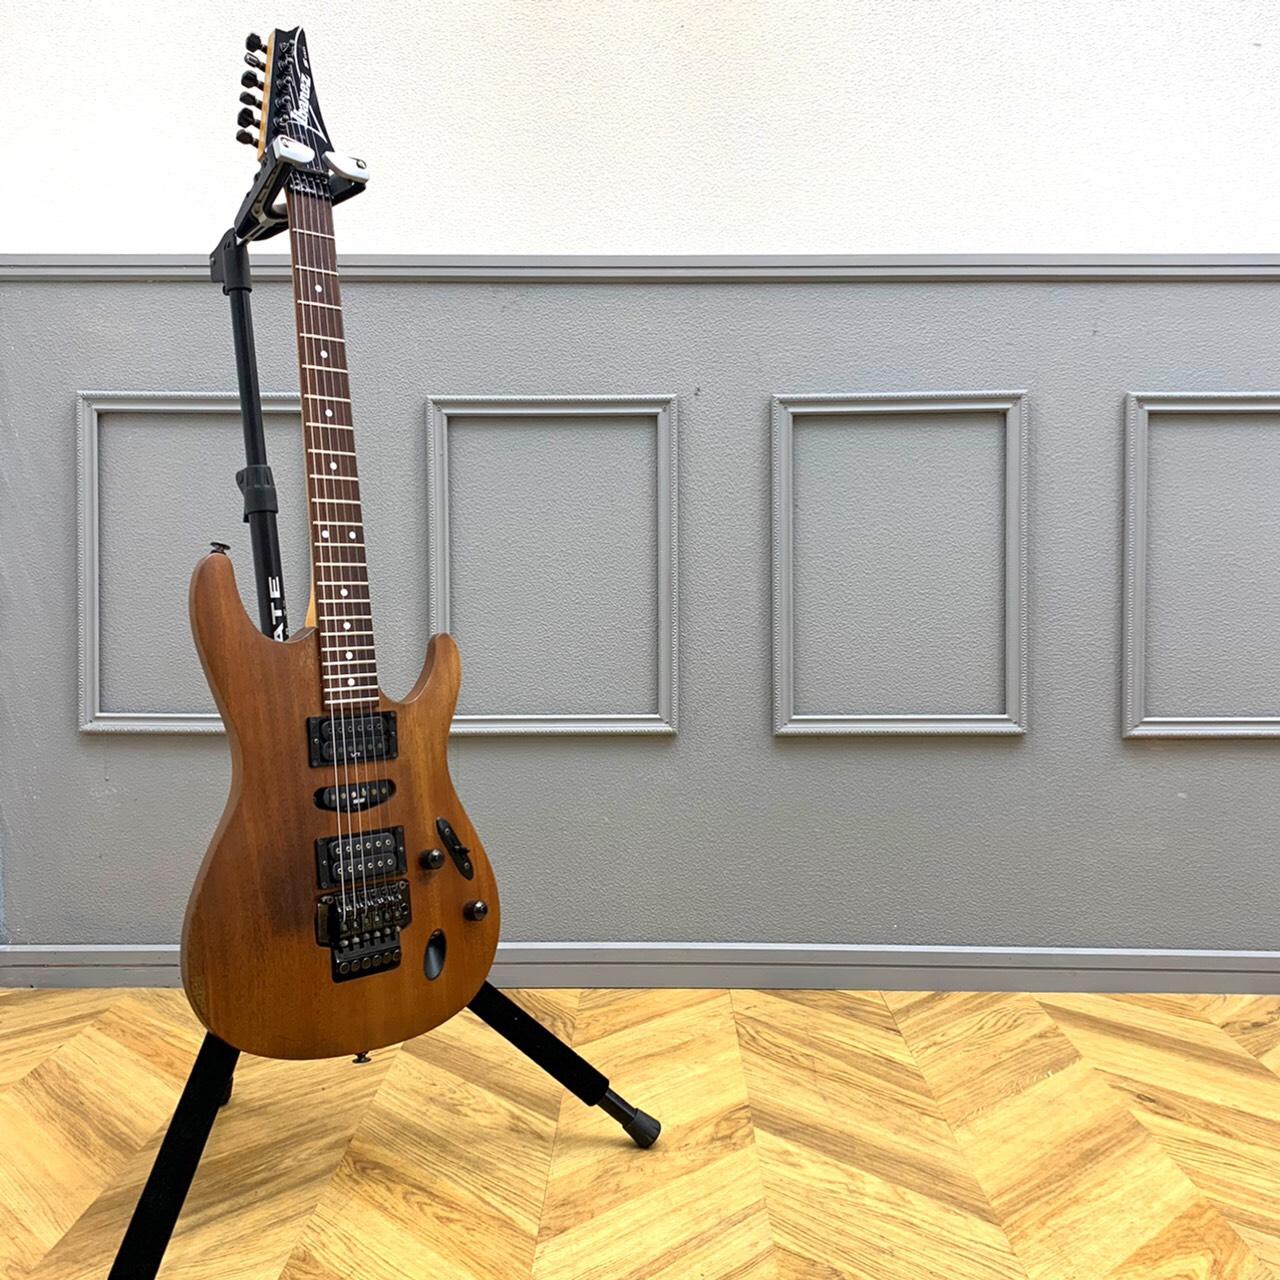 Ibanezアイバニーズ S370 エレキギター 1995年製造 国産 フジゲン オールマホガニーボディ